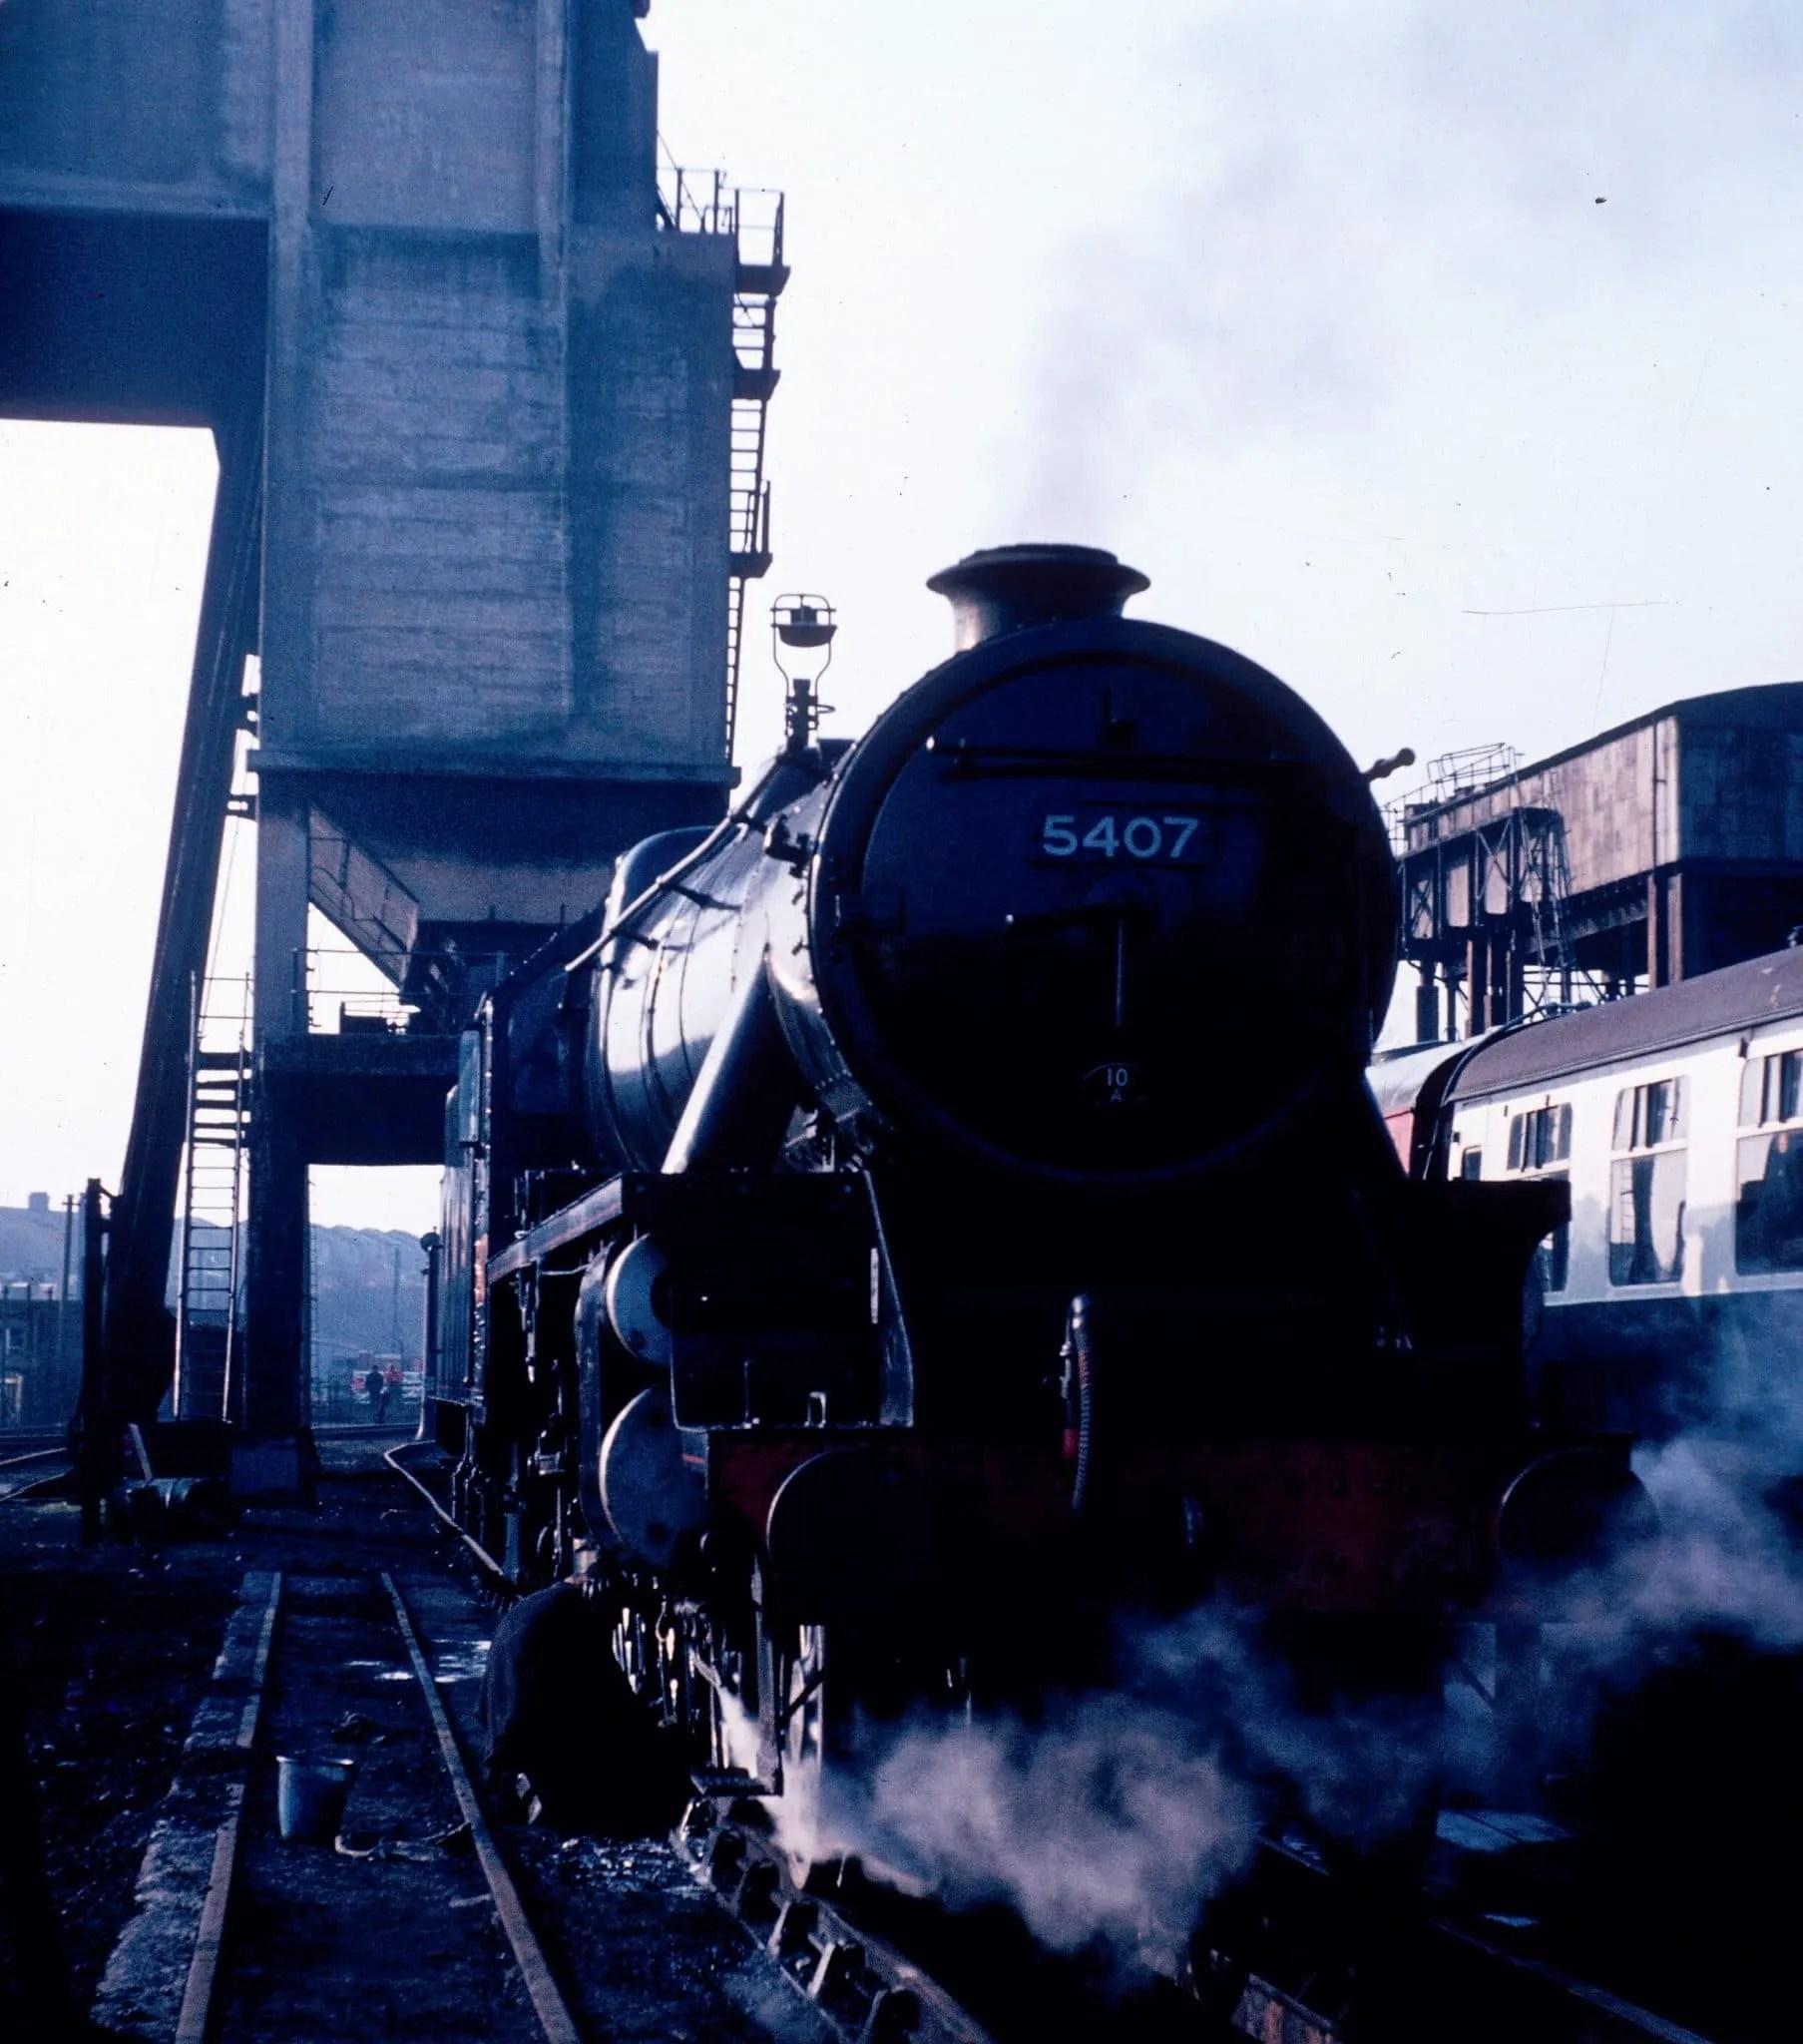 Steam locomotive Stanier Black Five 5407 Carnforth under coaling towers